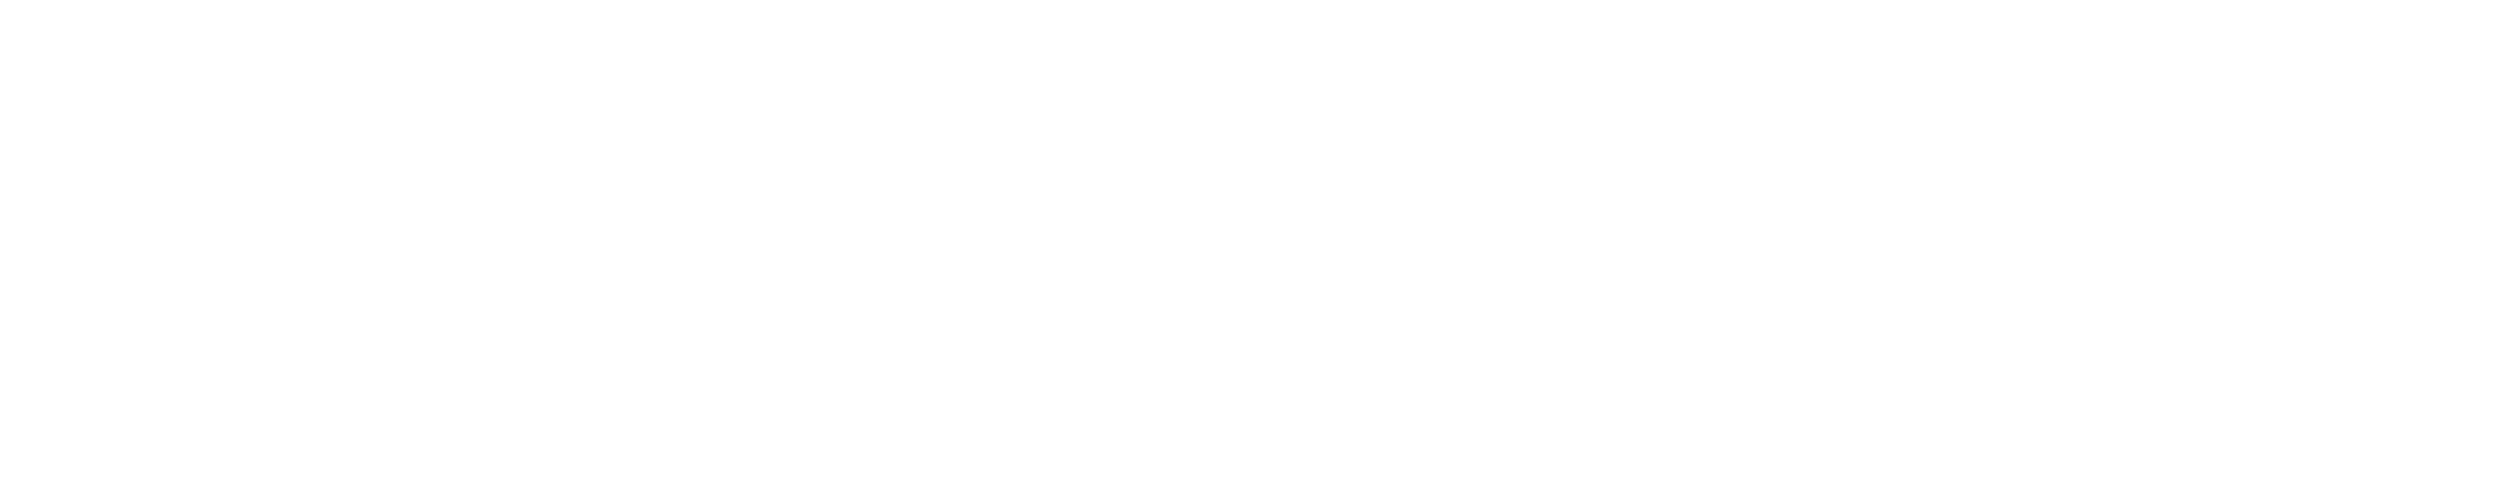 Portland State Universtiy logo